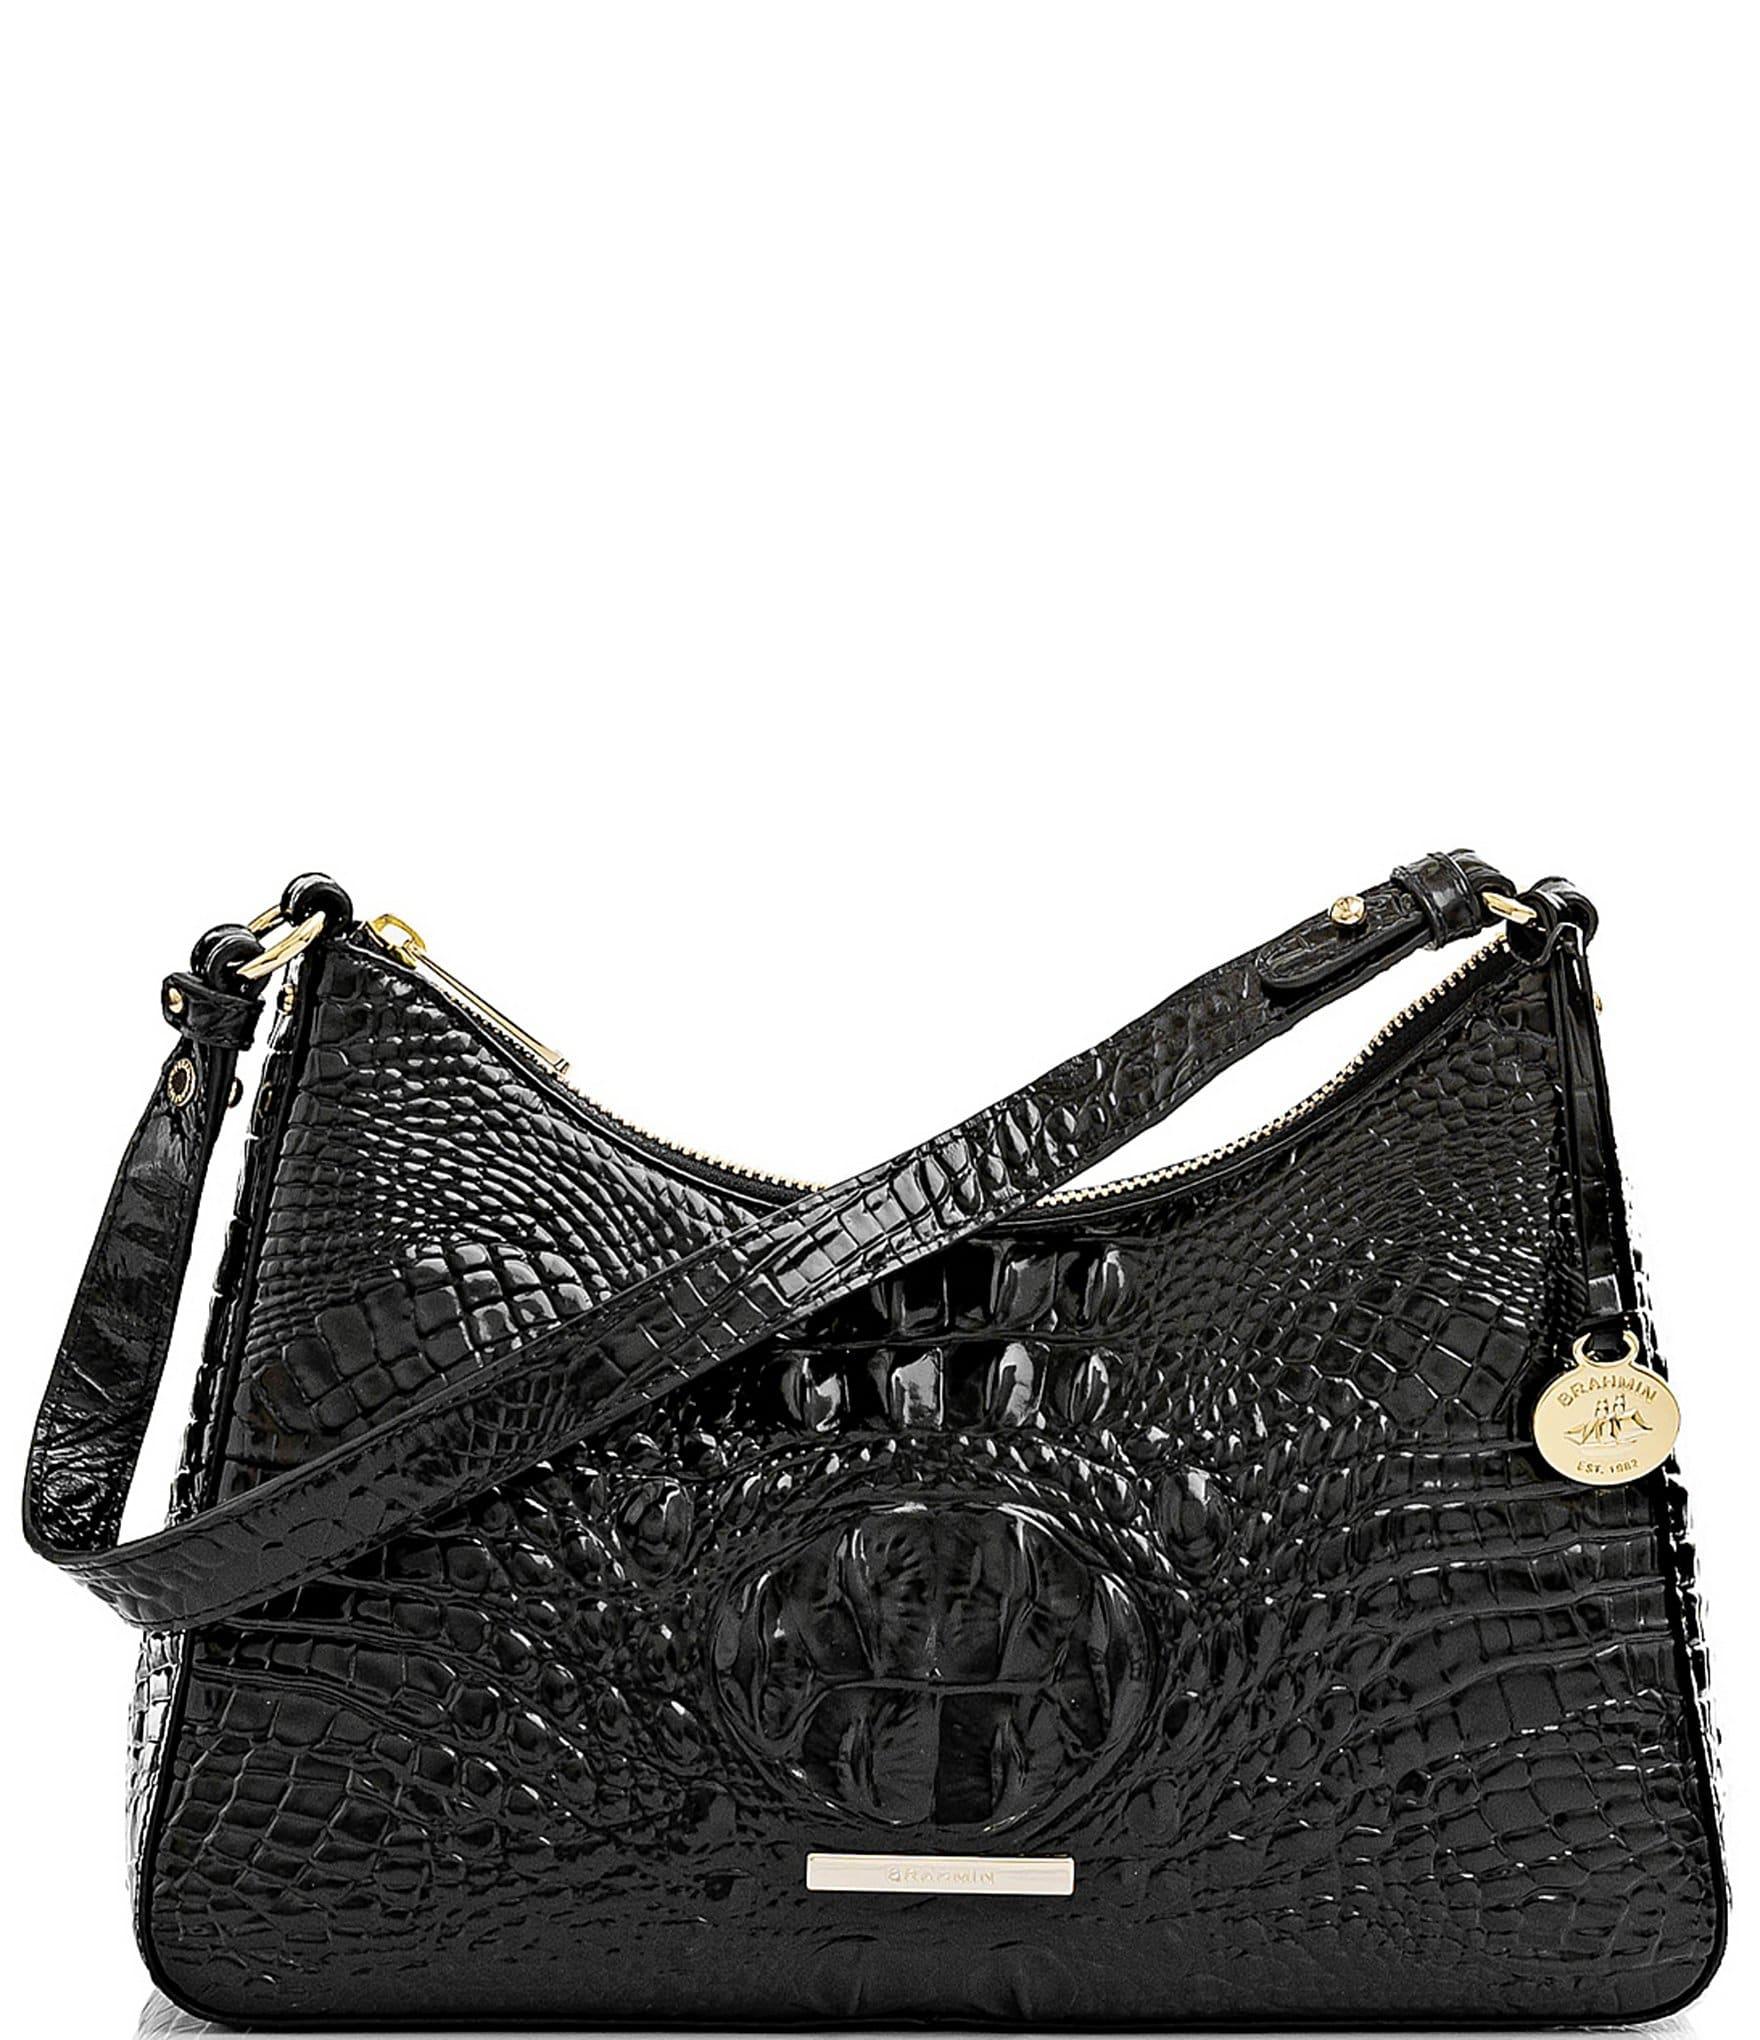 Compass Ladies Microfiber Handbag or Shoulder Bag Black